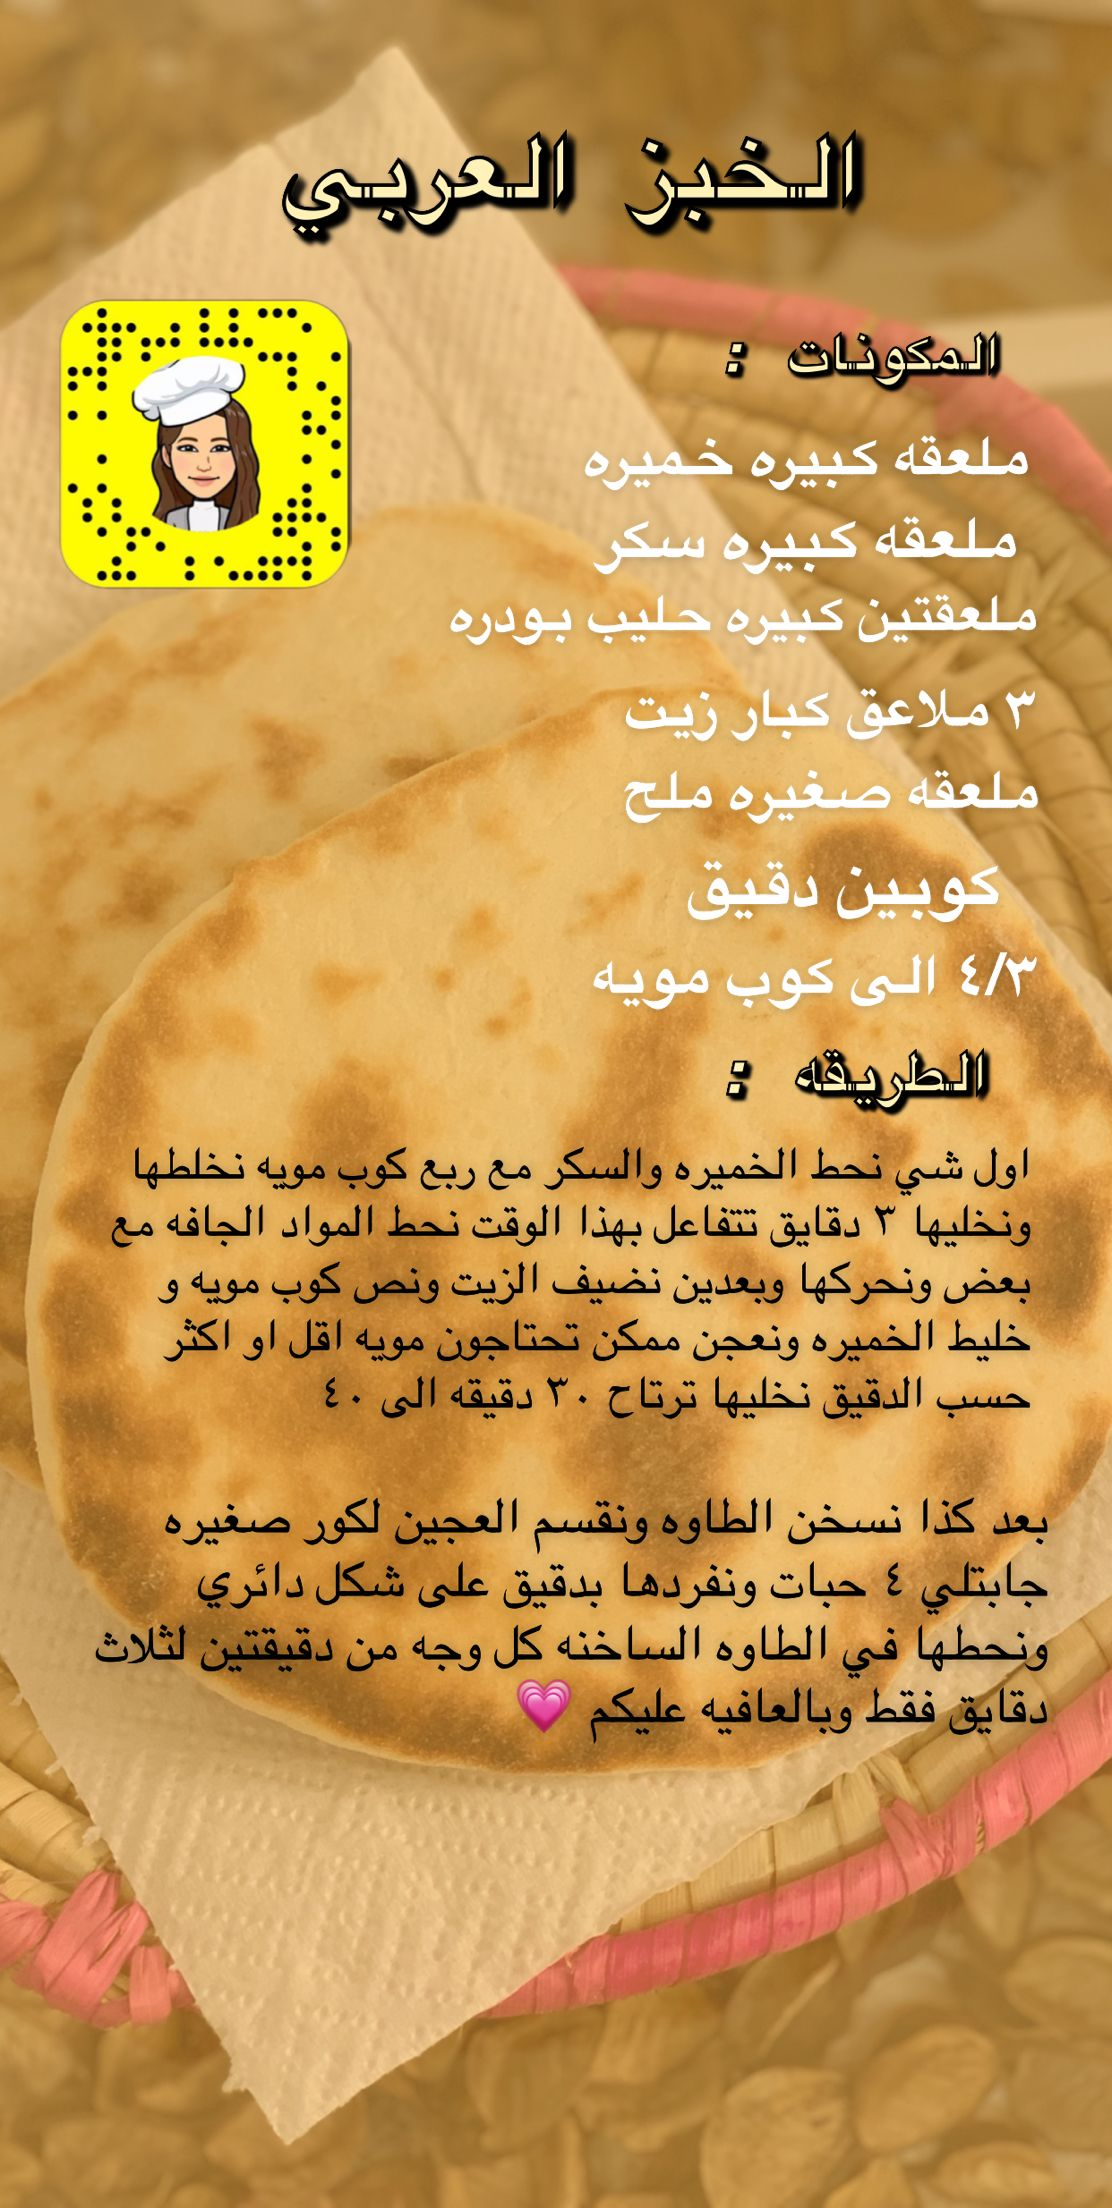 طبخ خبز عربي Food Videos Desserts Diy Food Recipes Cookout Food